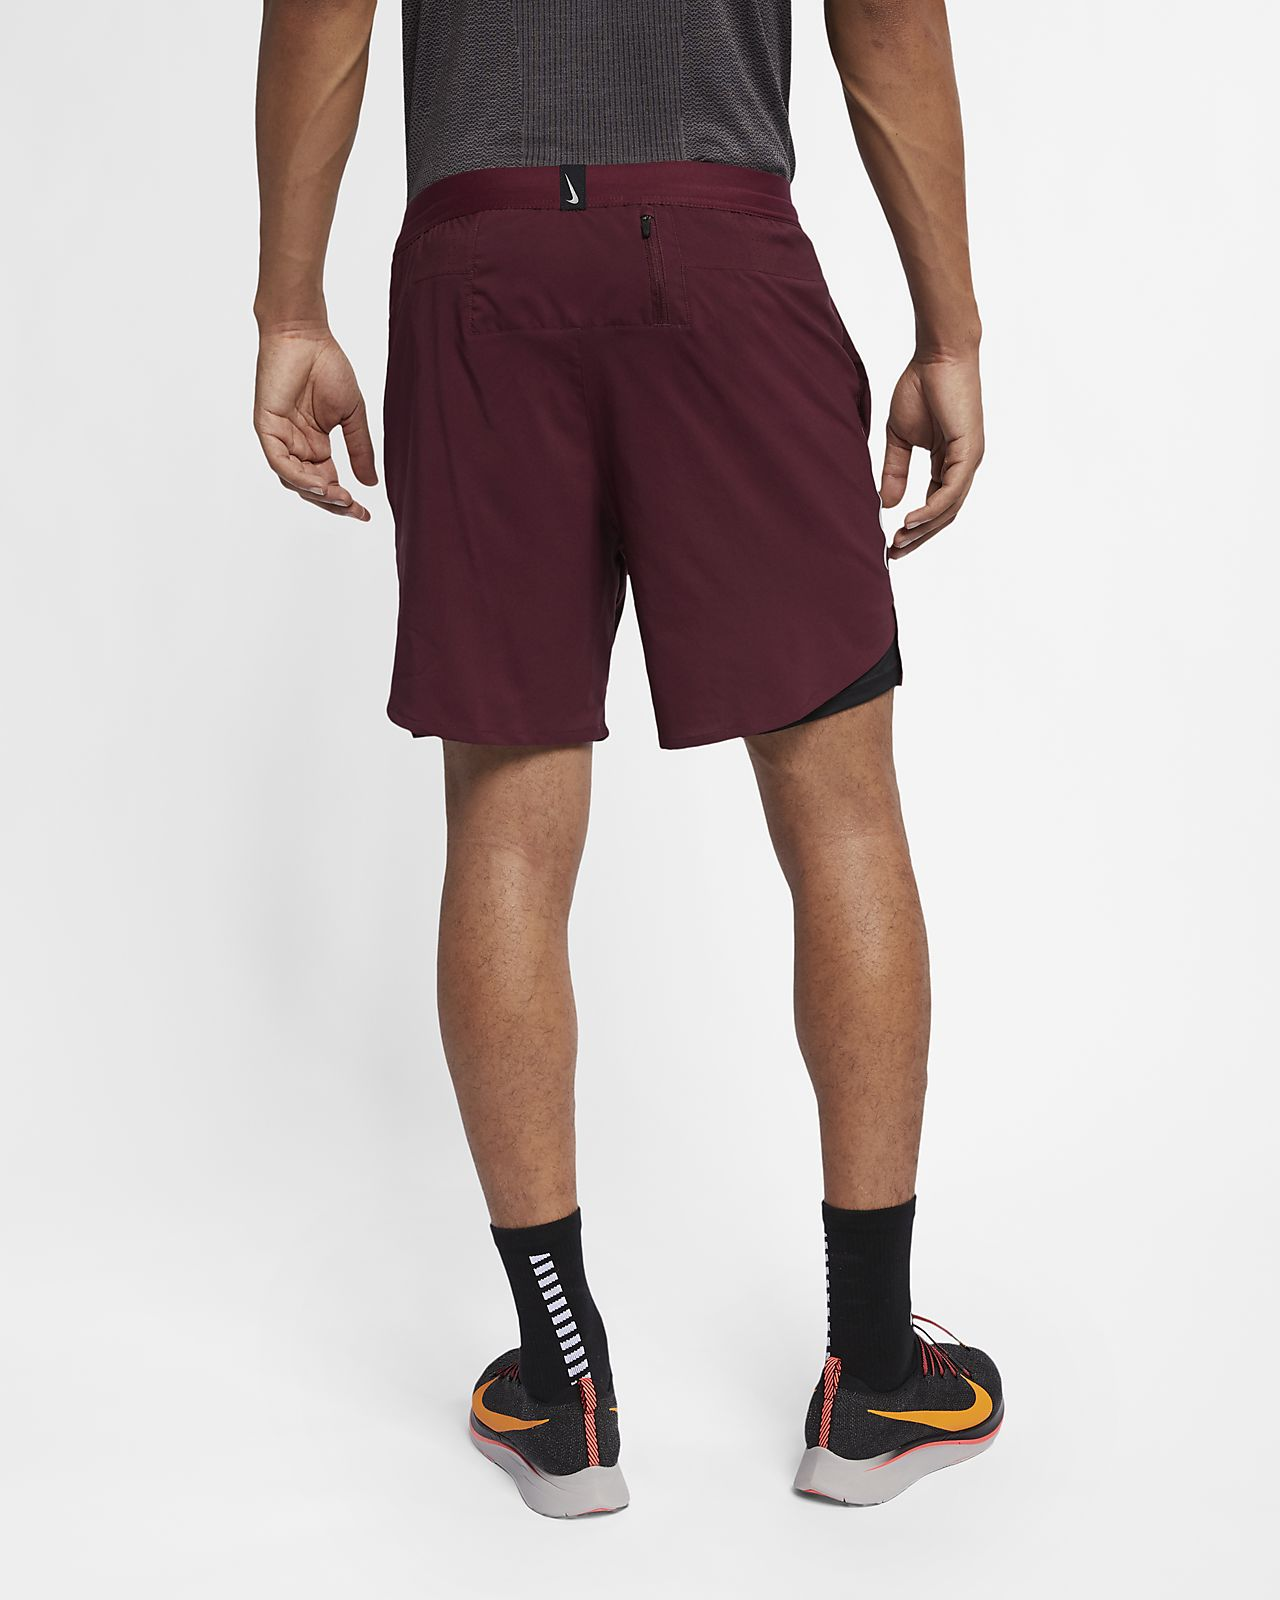 c3d0749952391f Nike Dri-FIT Flex Stride Men's 7